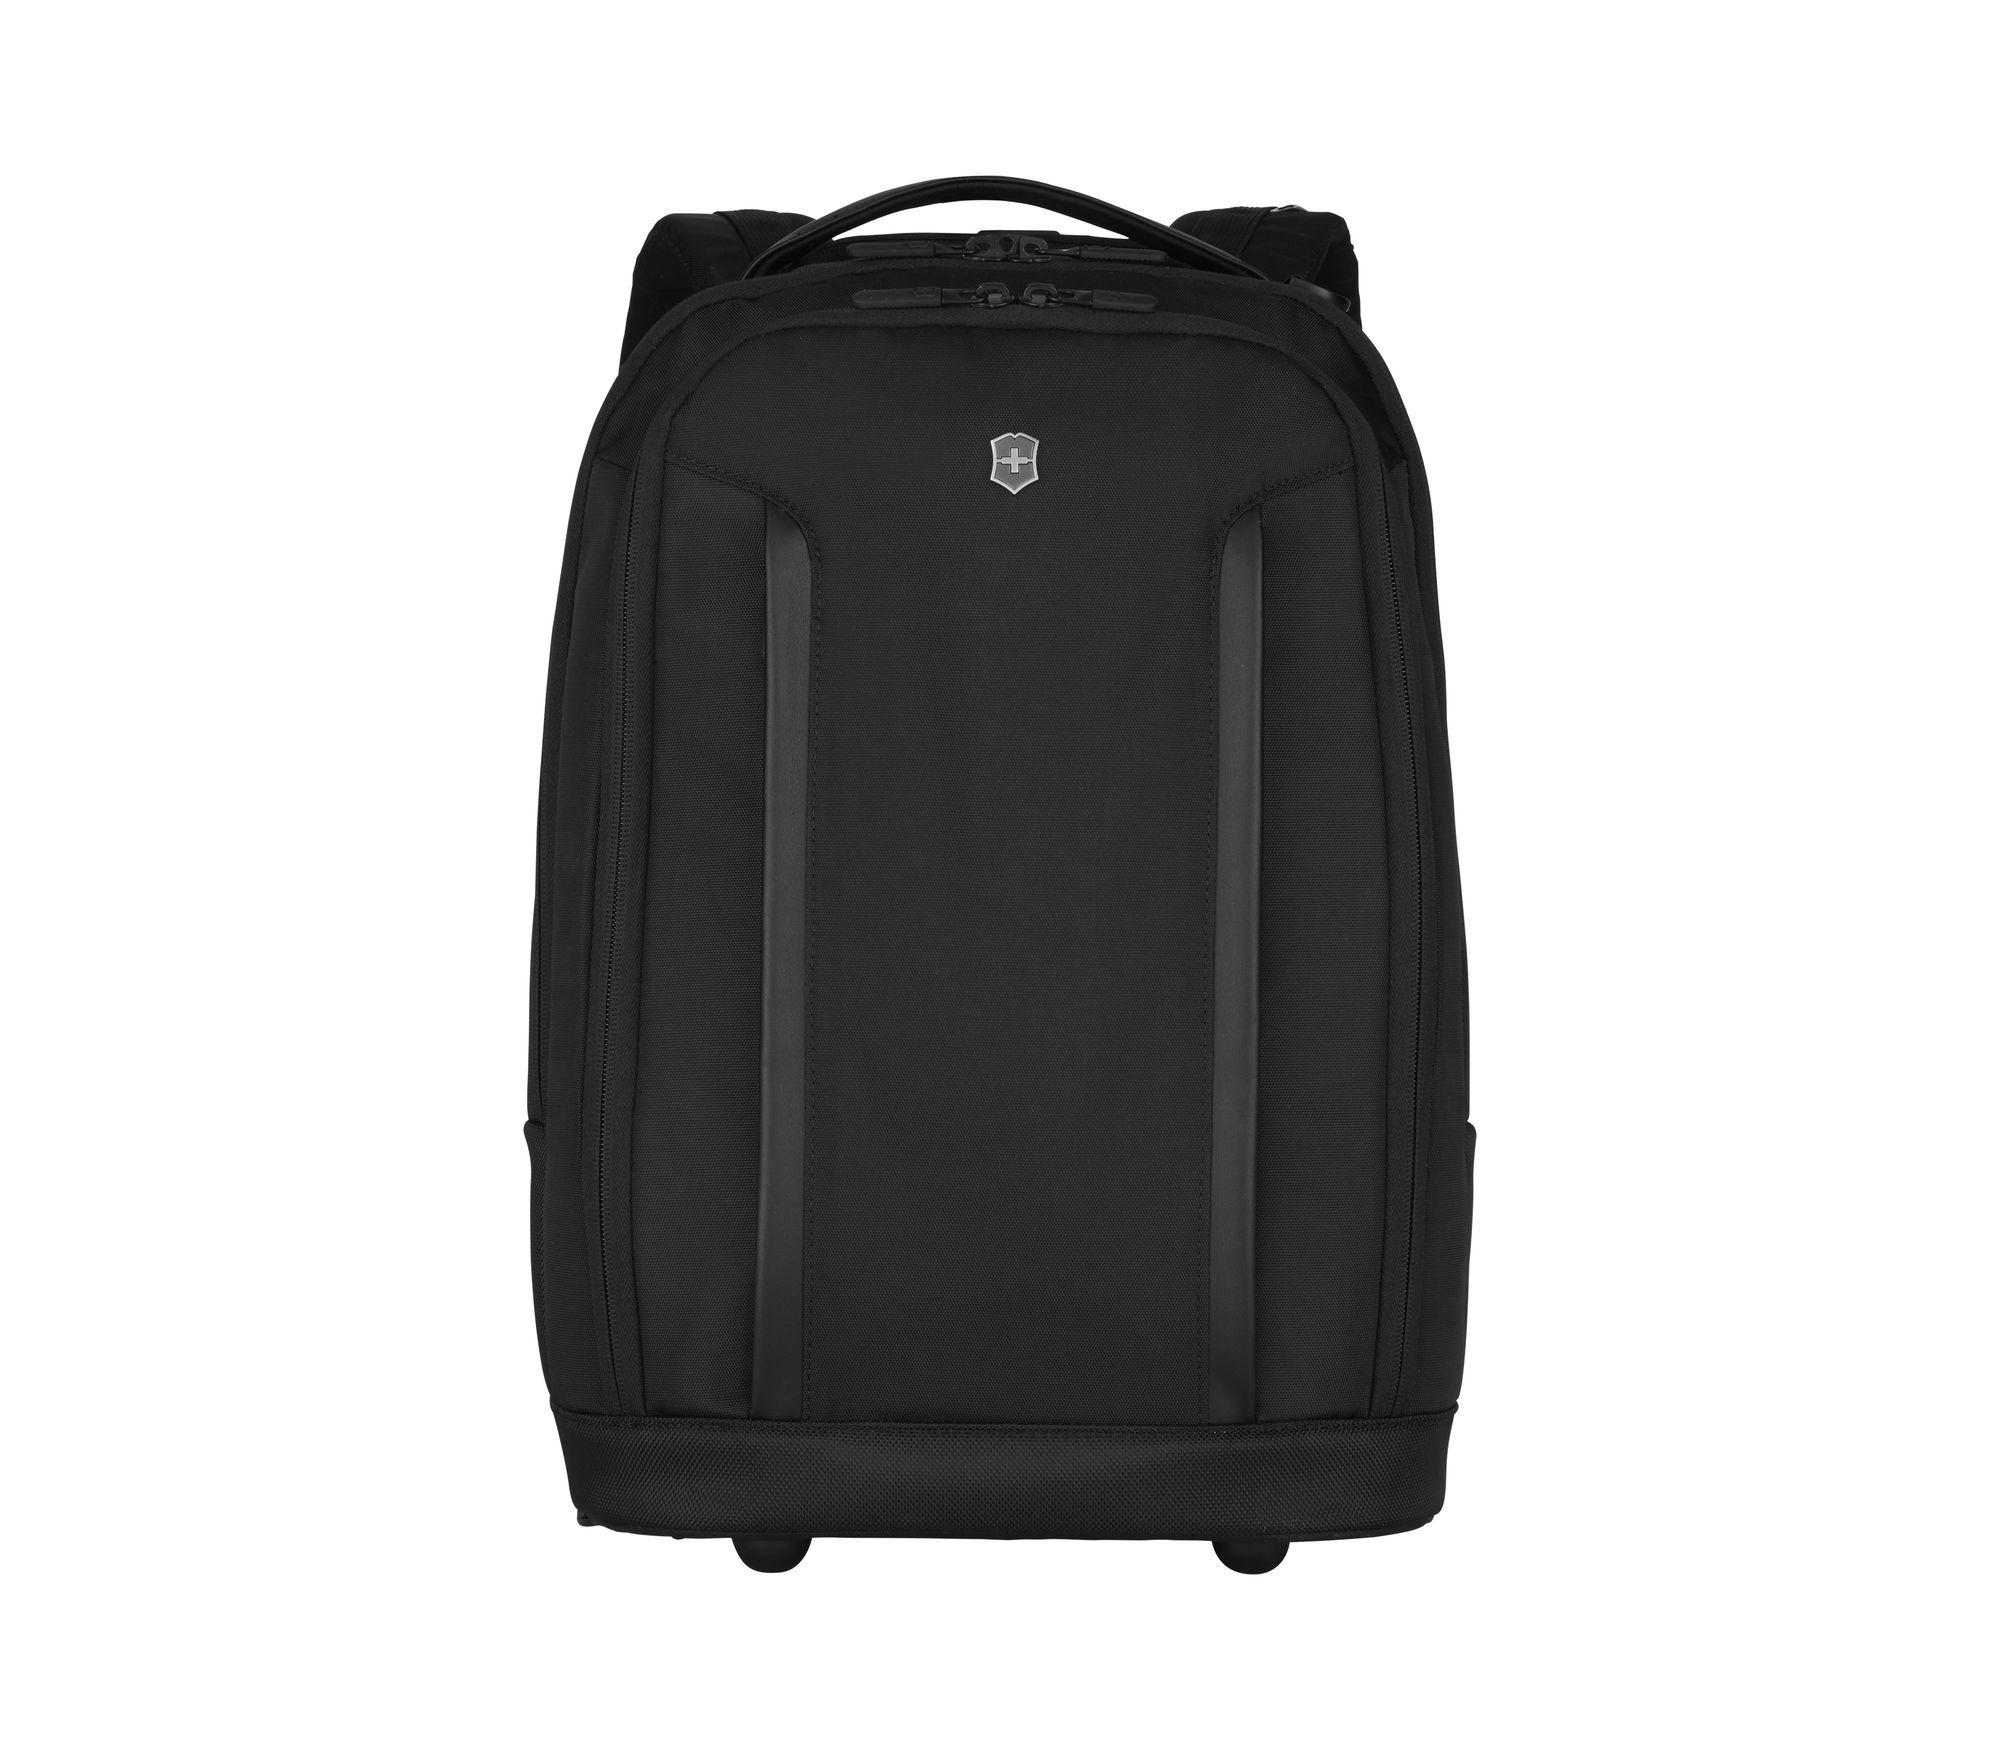 Mochila para laptop com rodas - Preto - Victorinox